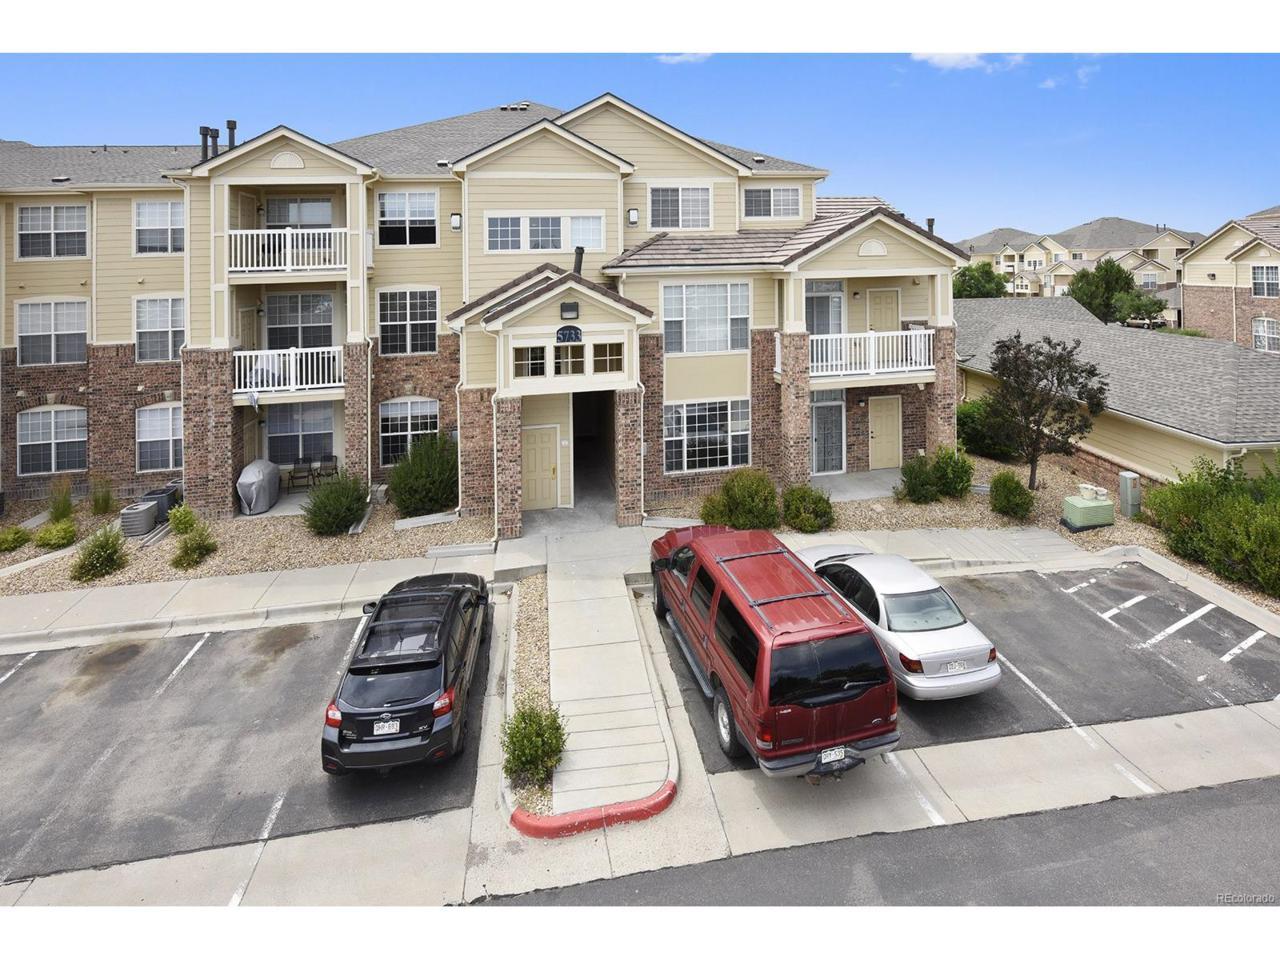 5733 N Gibralter Way 3-107, Aurora, CO 80019 (MLS #4212487) :: 8z Real Estate